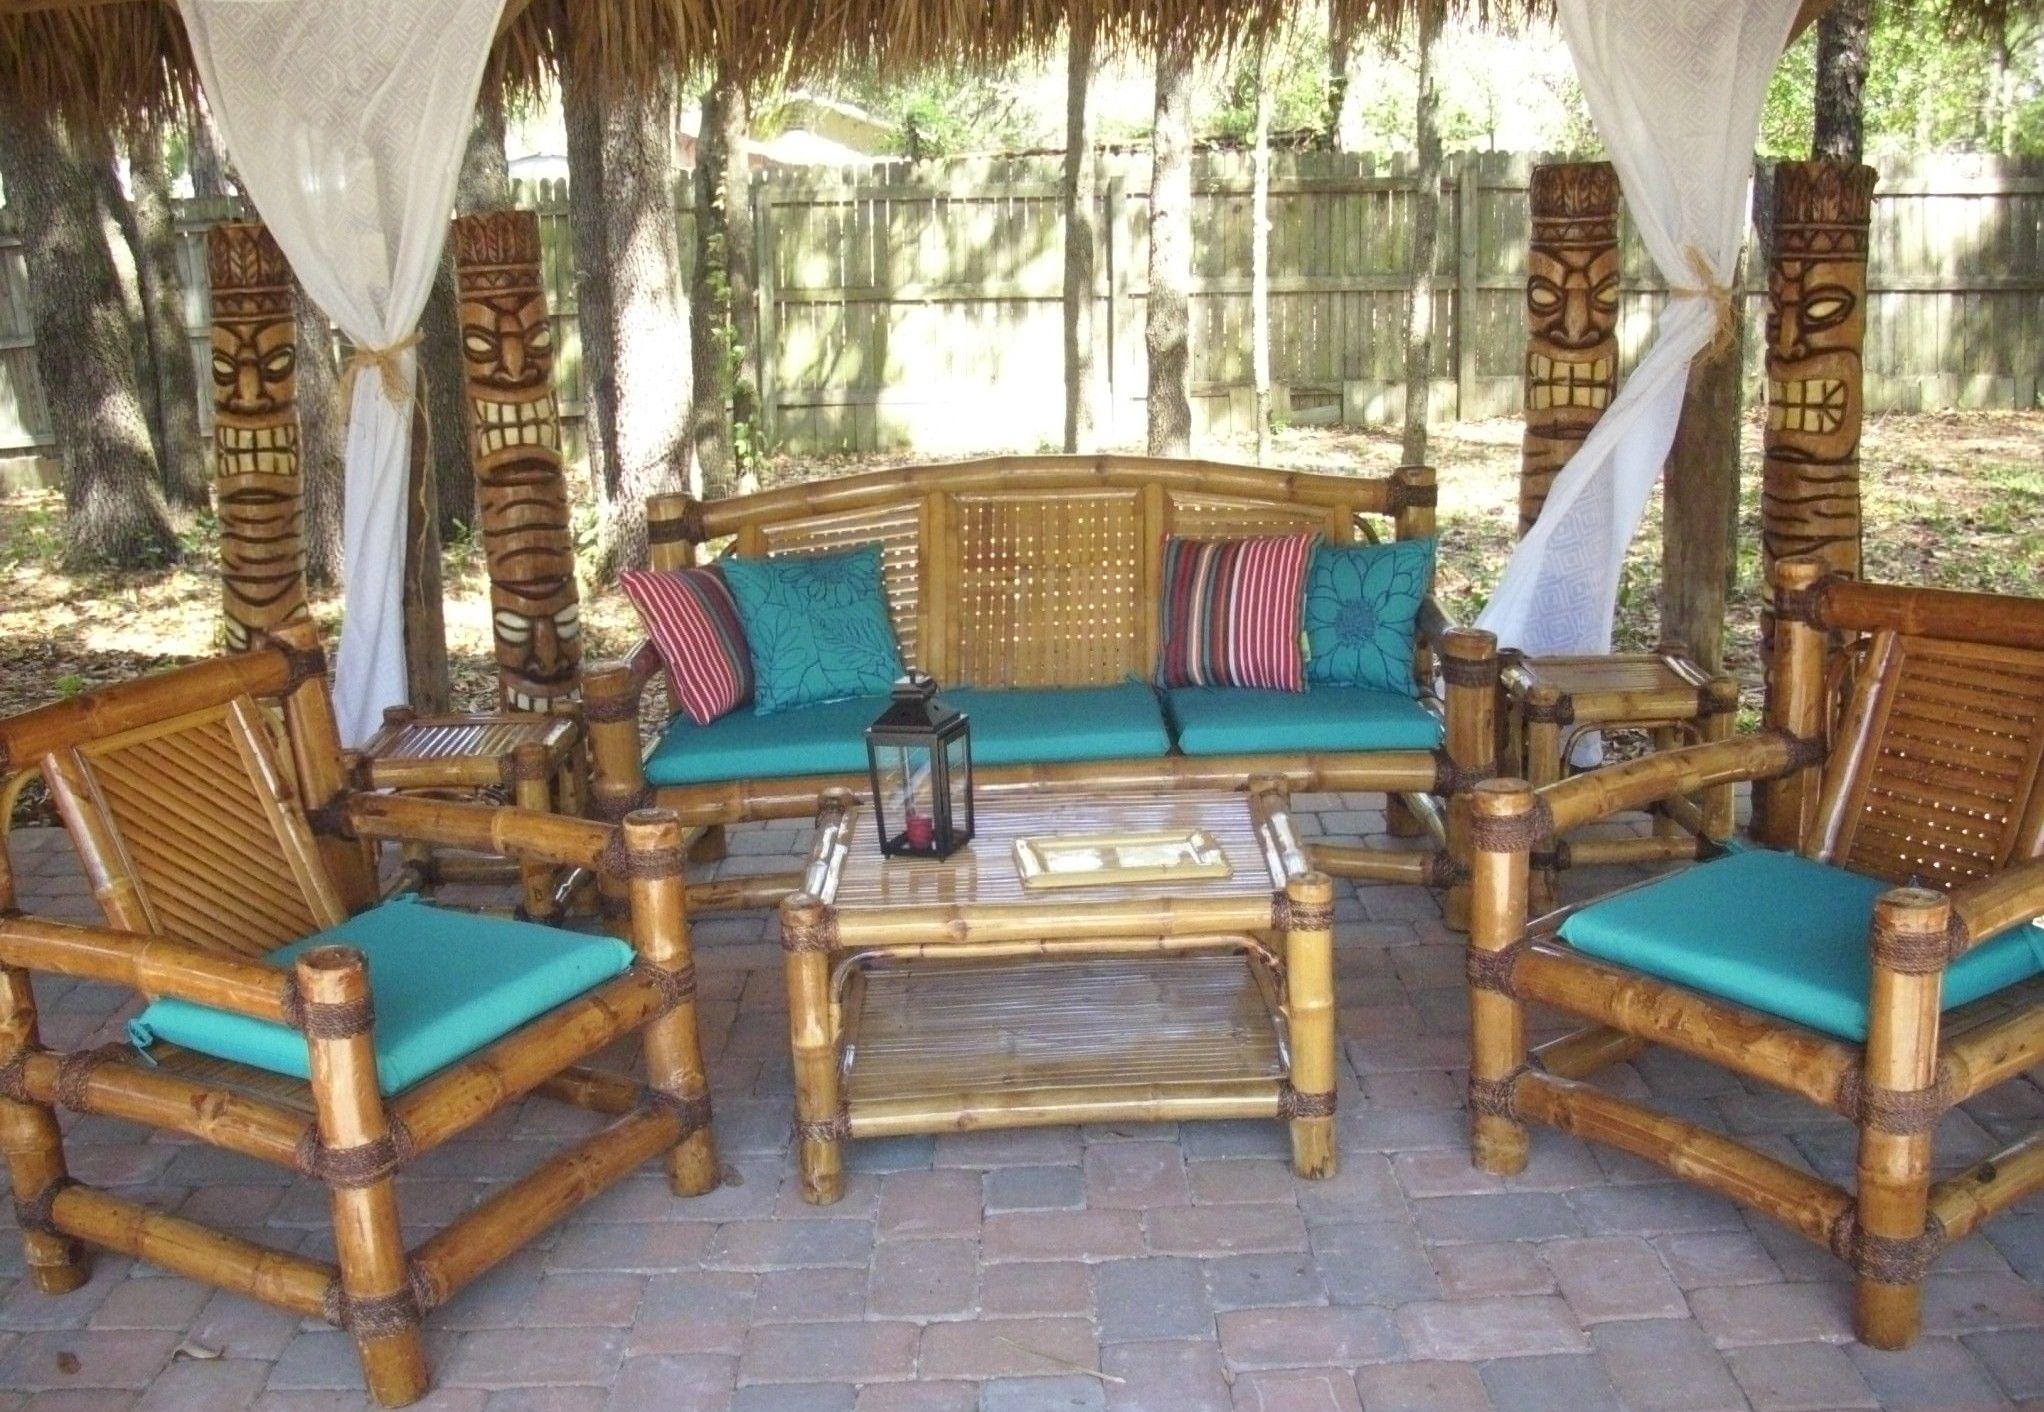 Tropical Garden Furniture Bamboo Tiki Huts Bars Benches ...